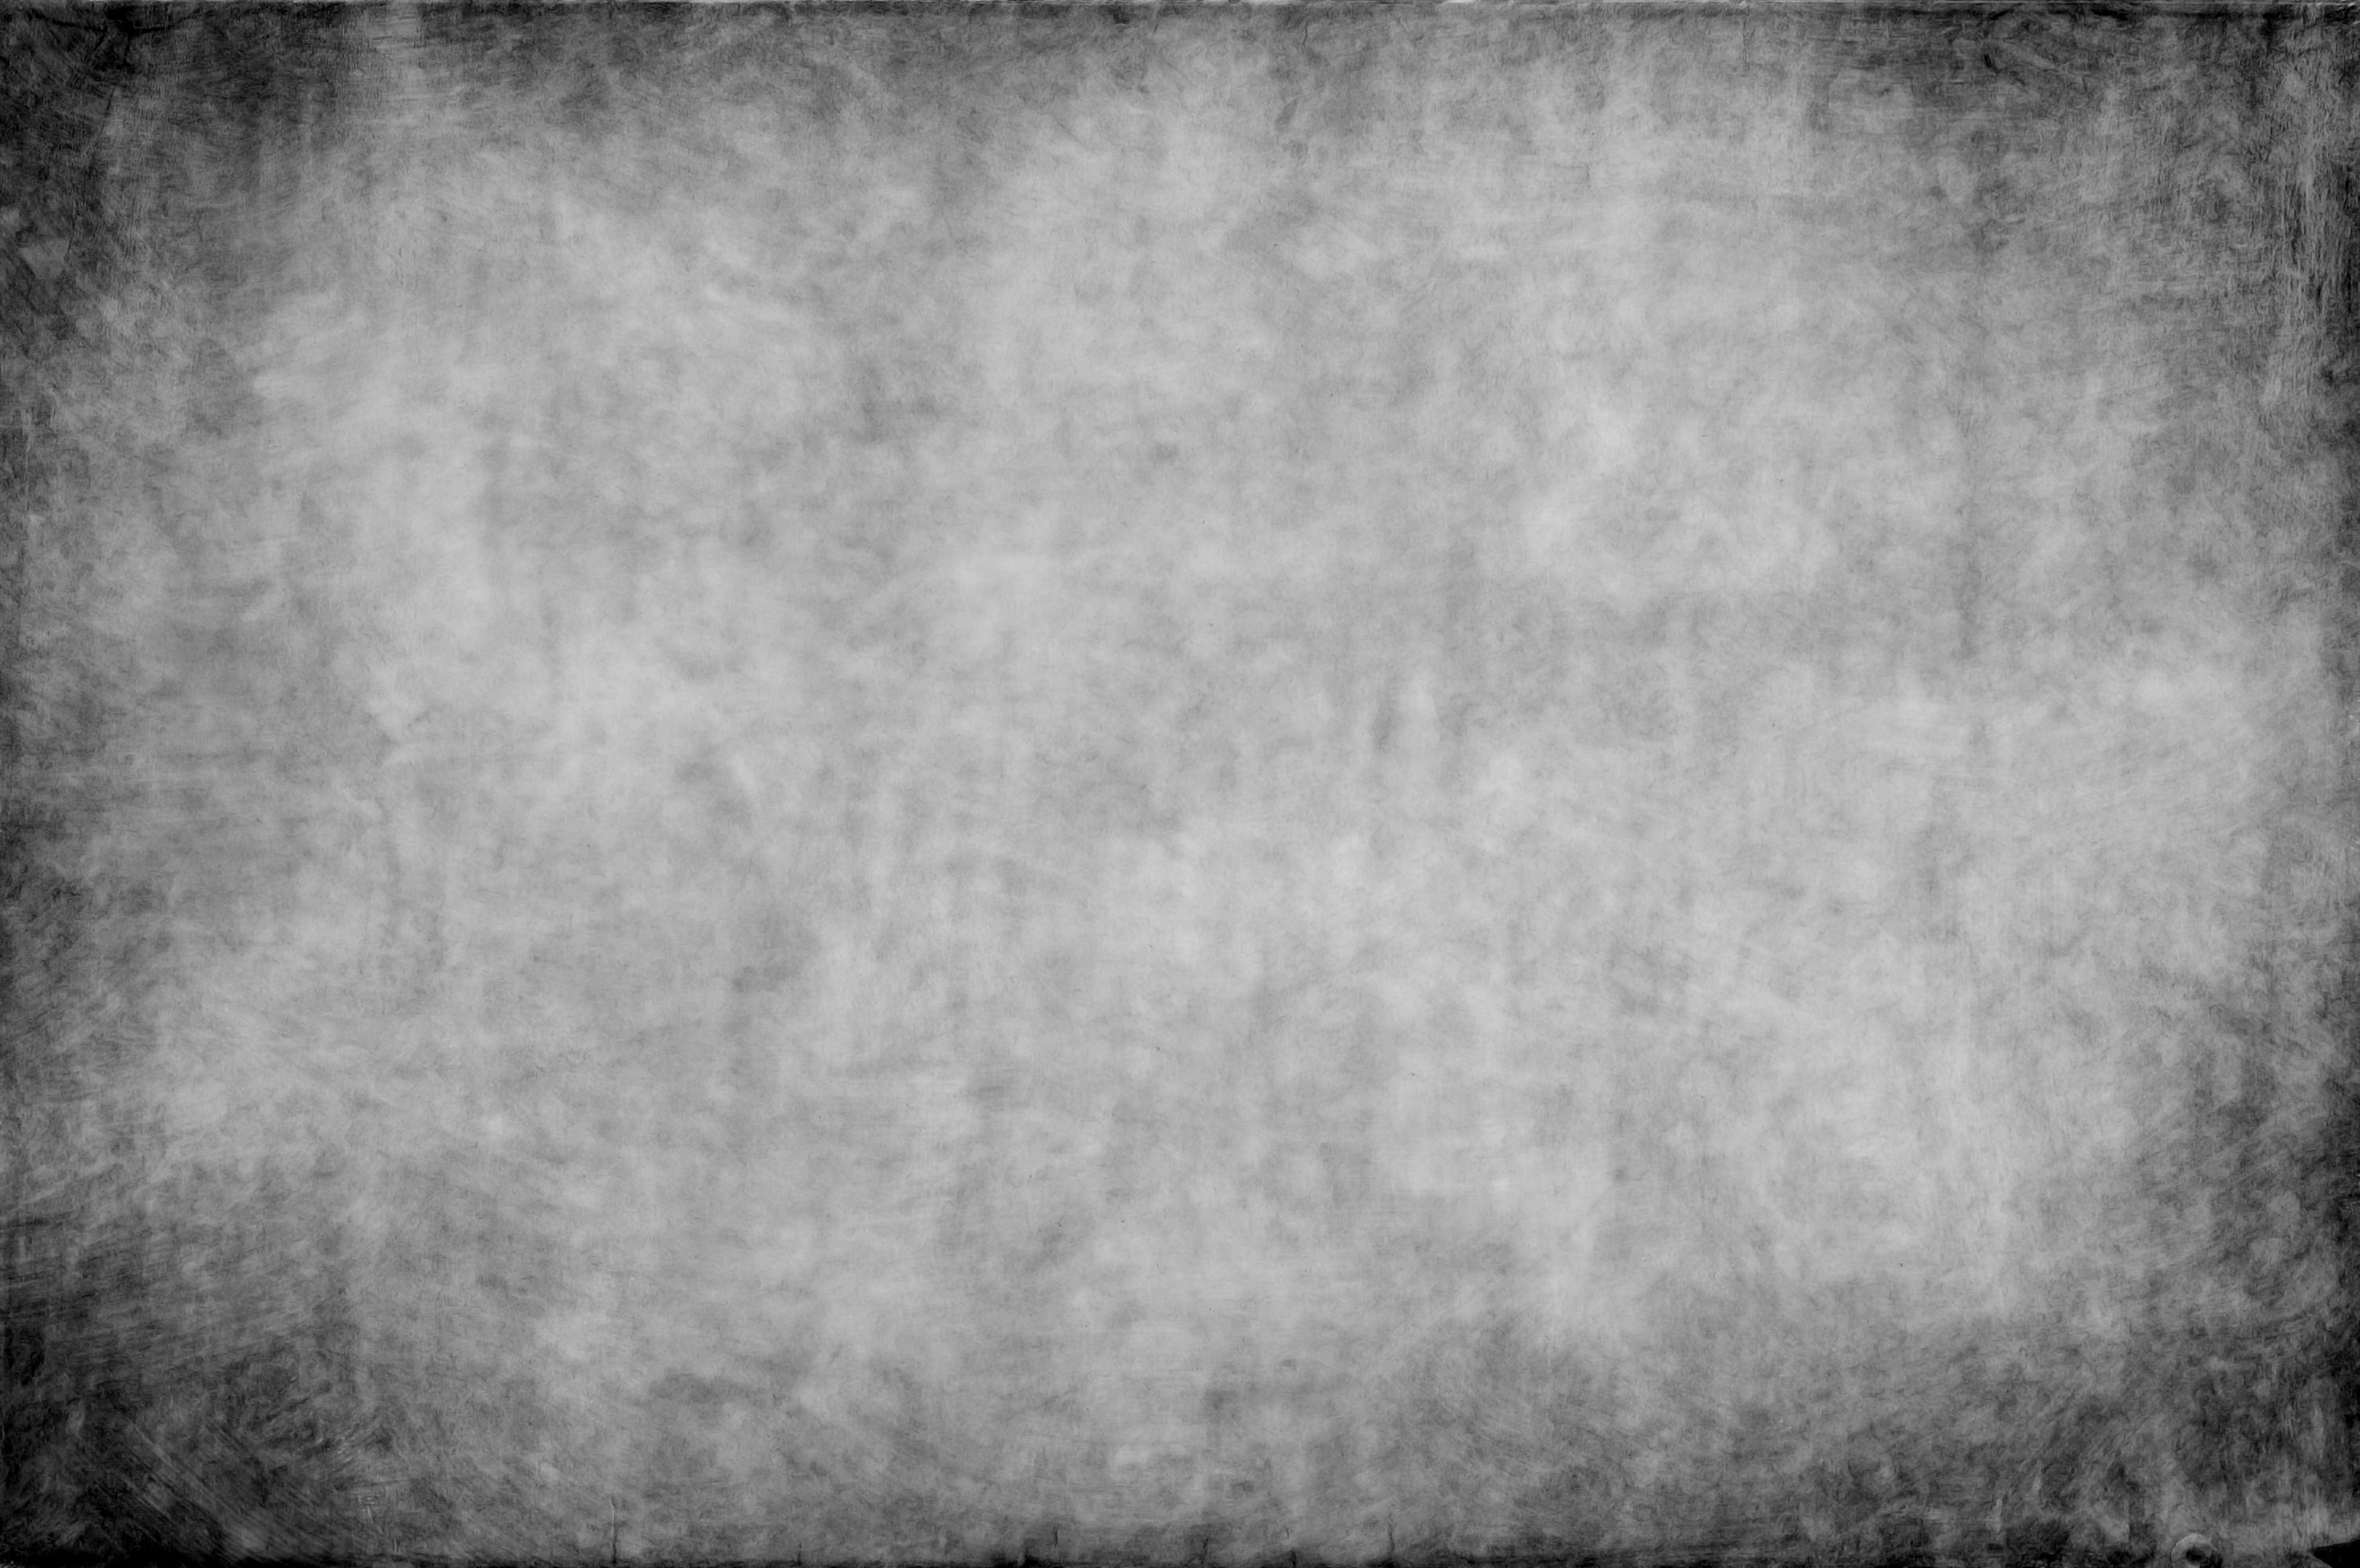 Black Grey Grungy Texture Wallpaper Metal Texture Texture Grunge Textures